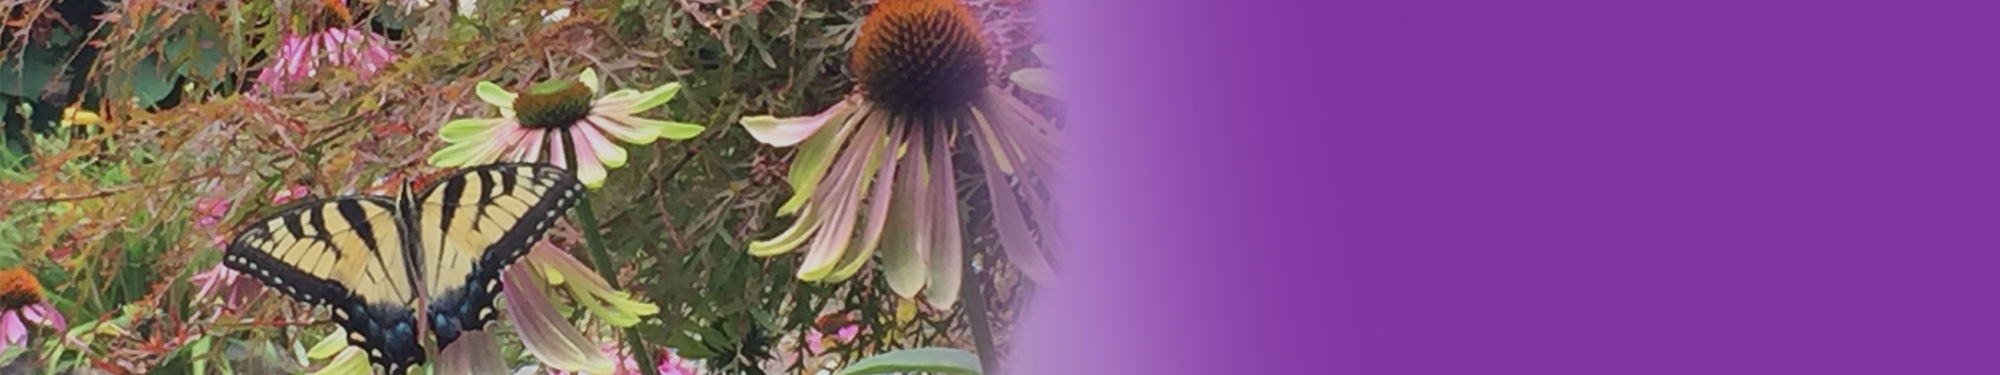 sunflower-butterfly-plants-murrysville-1